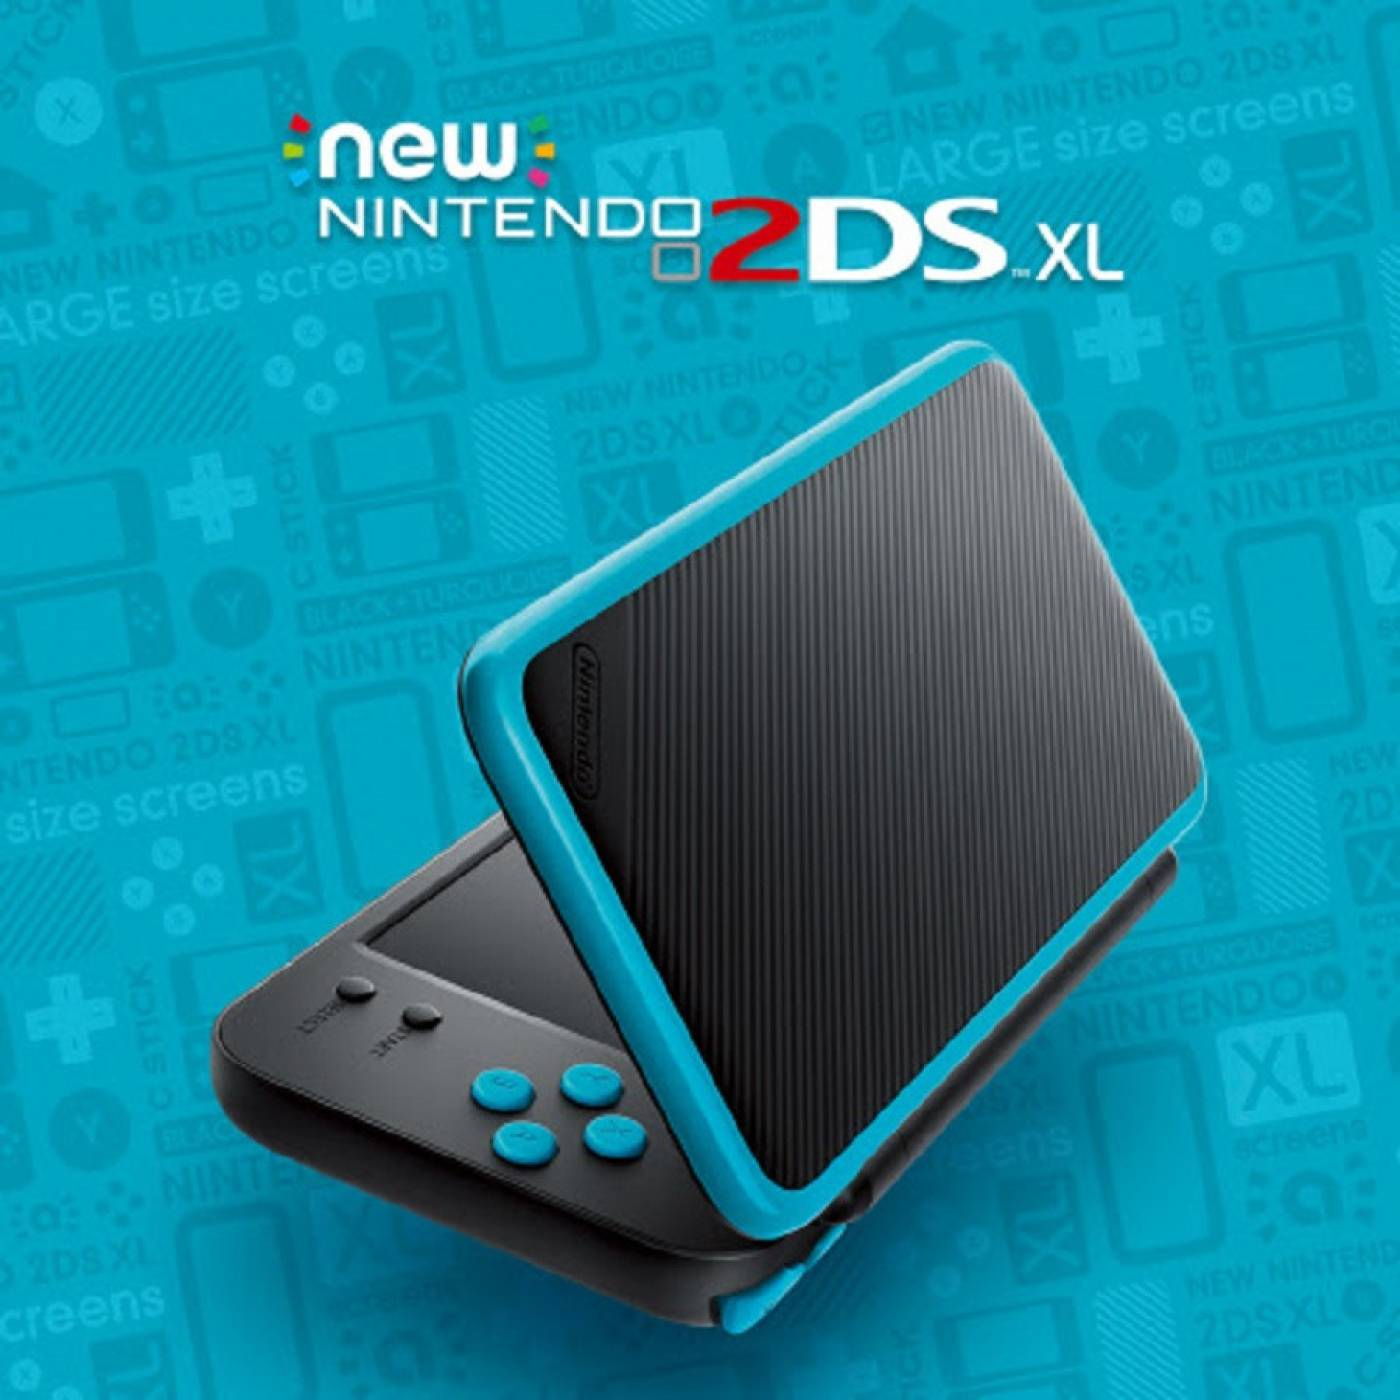 Nintendo е властелин на гейм рекламите и през август